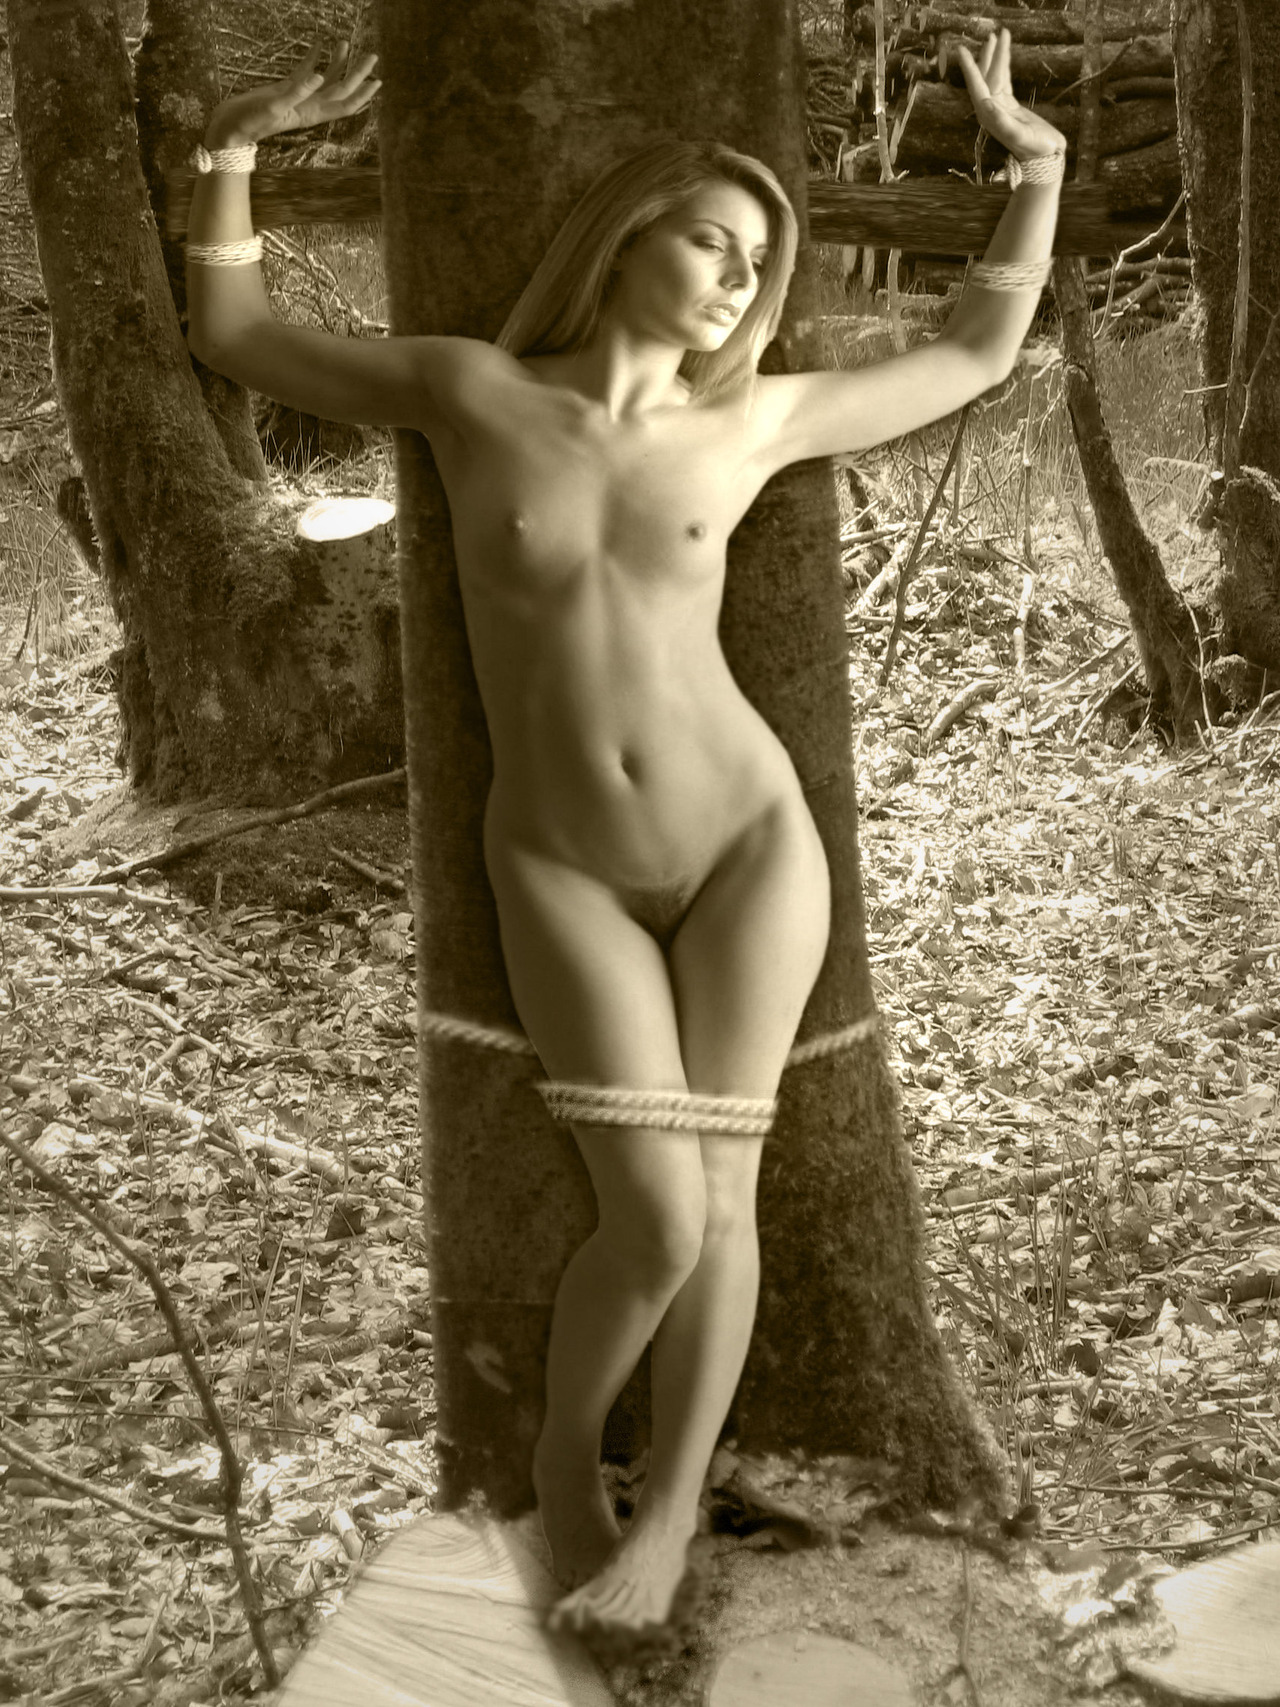 jewish girls stripped naked